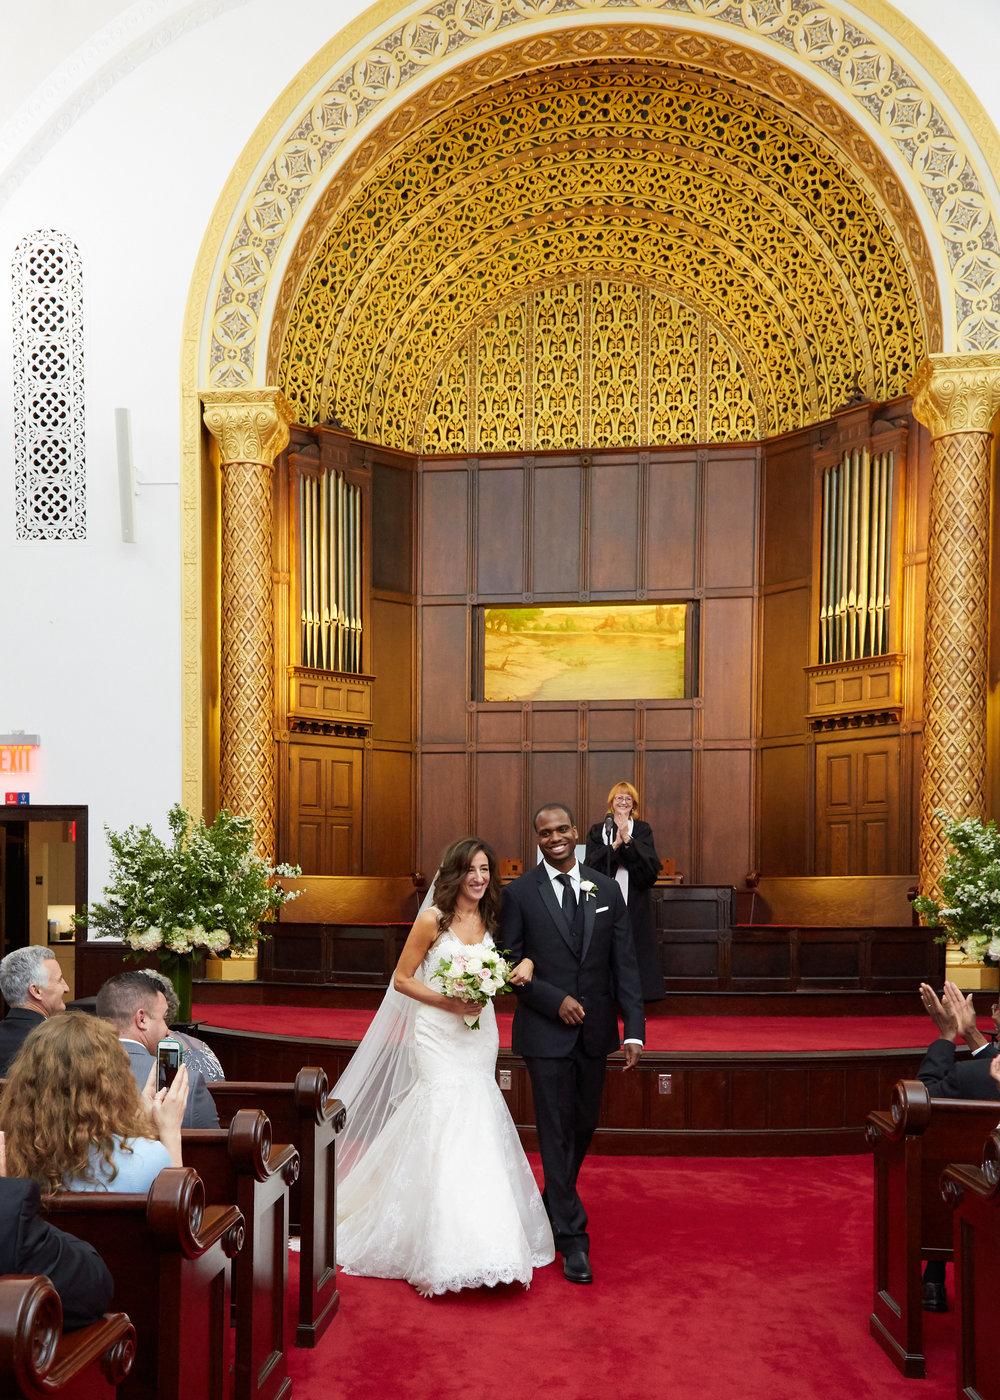 180601_AnnaAdom_CP_Wedding_ 146.jpg